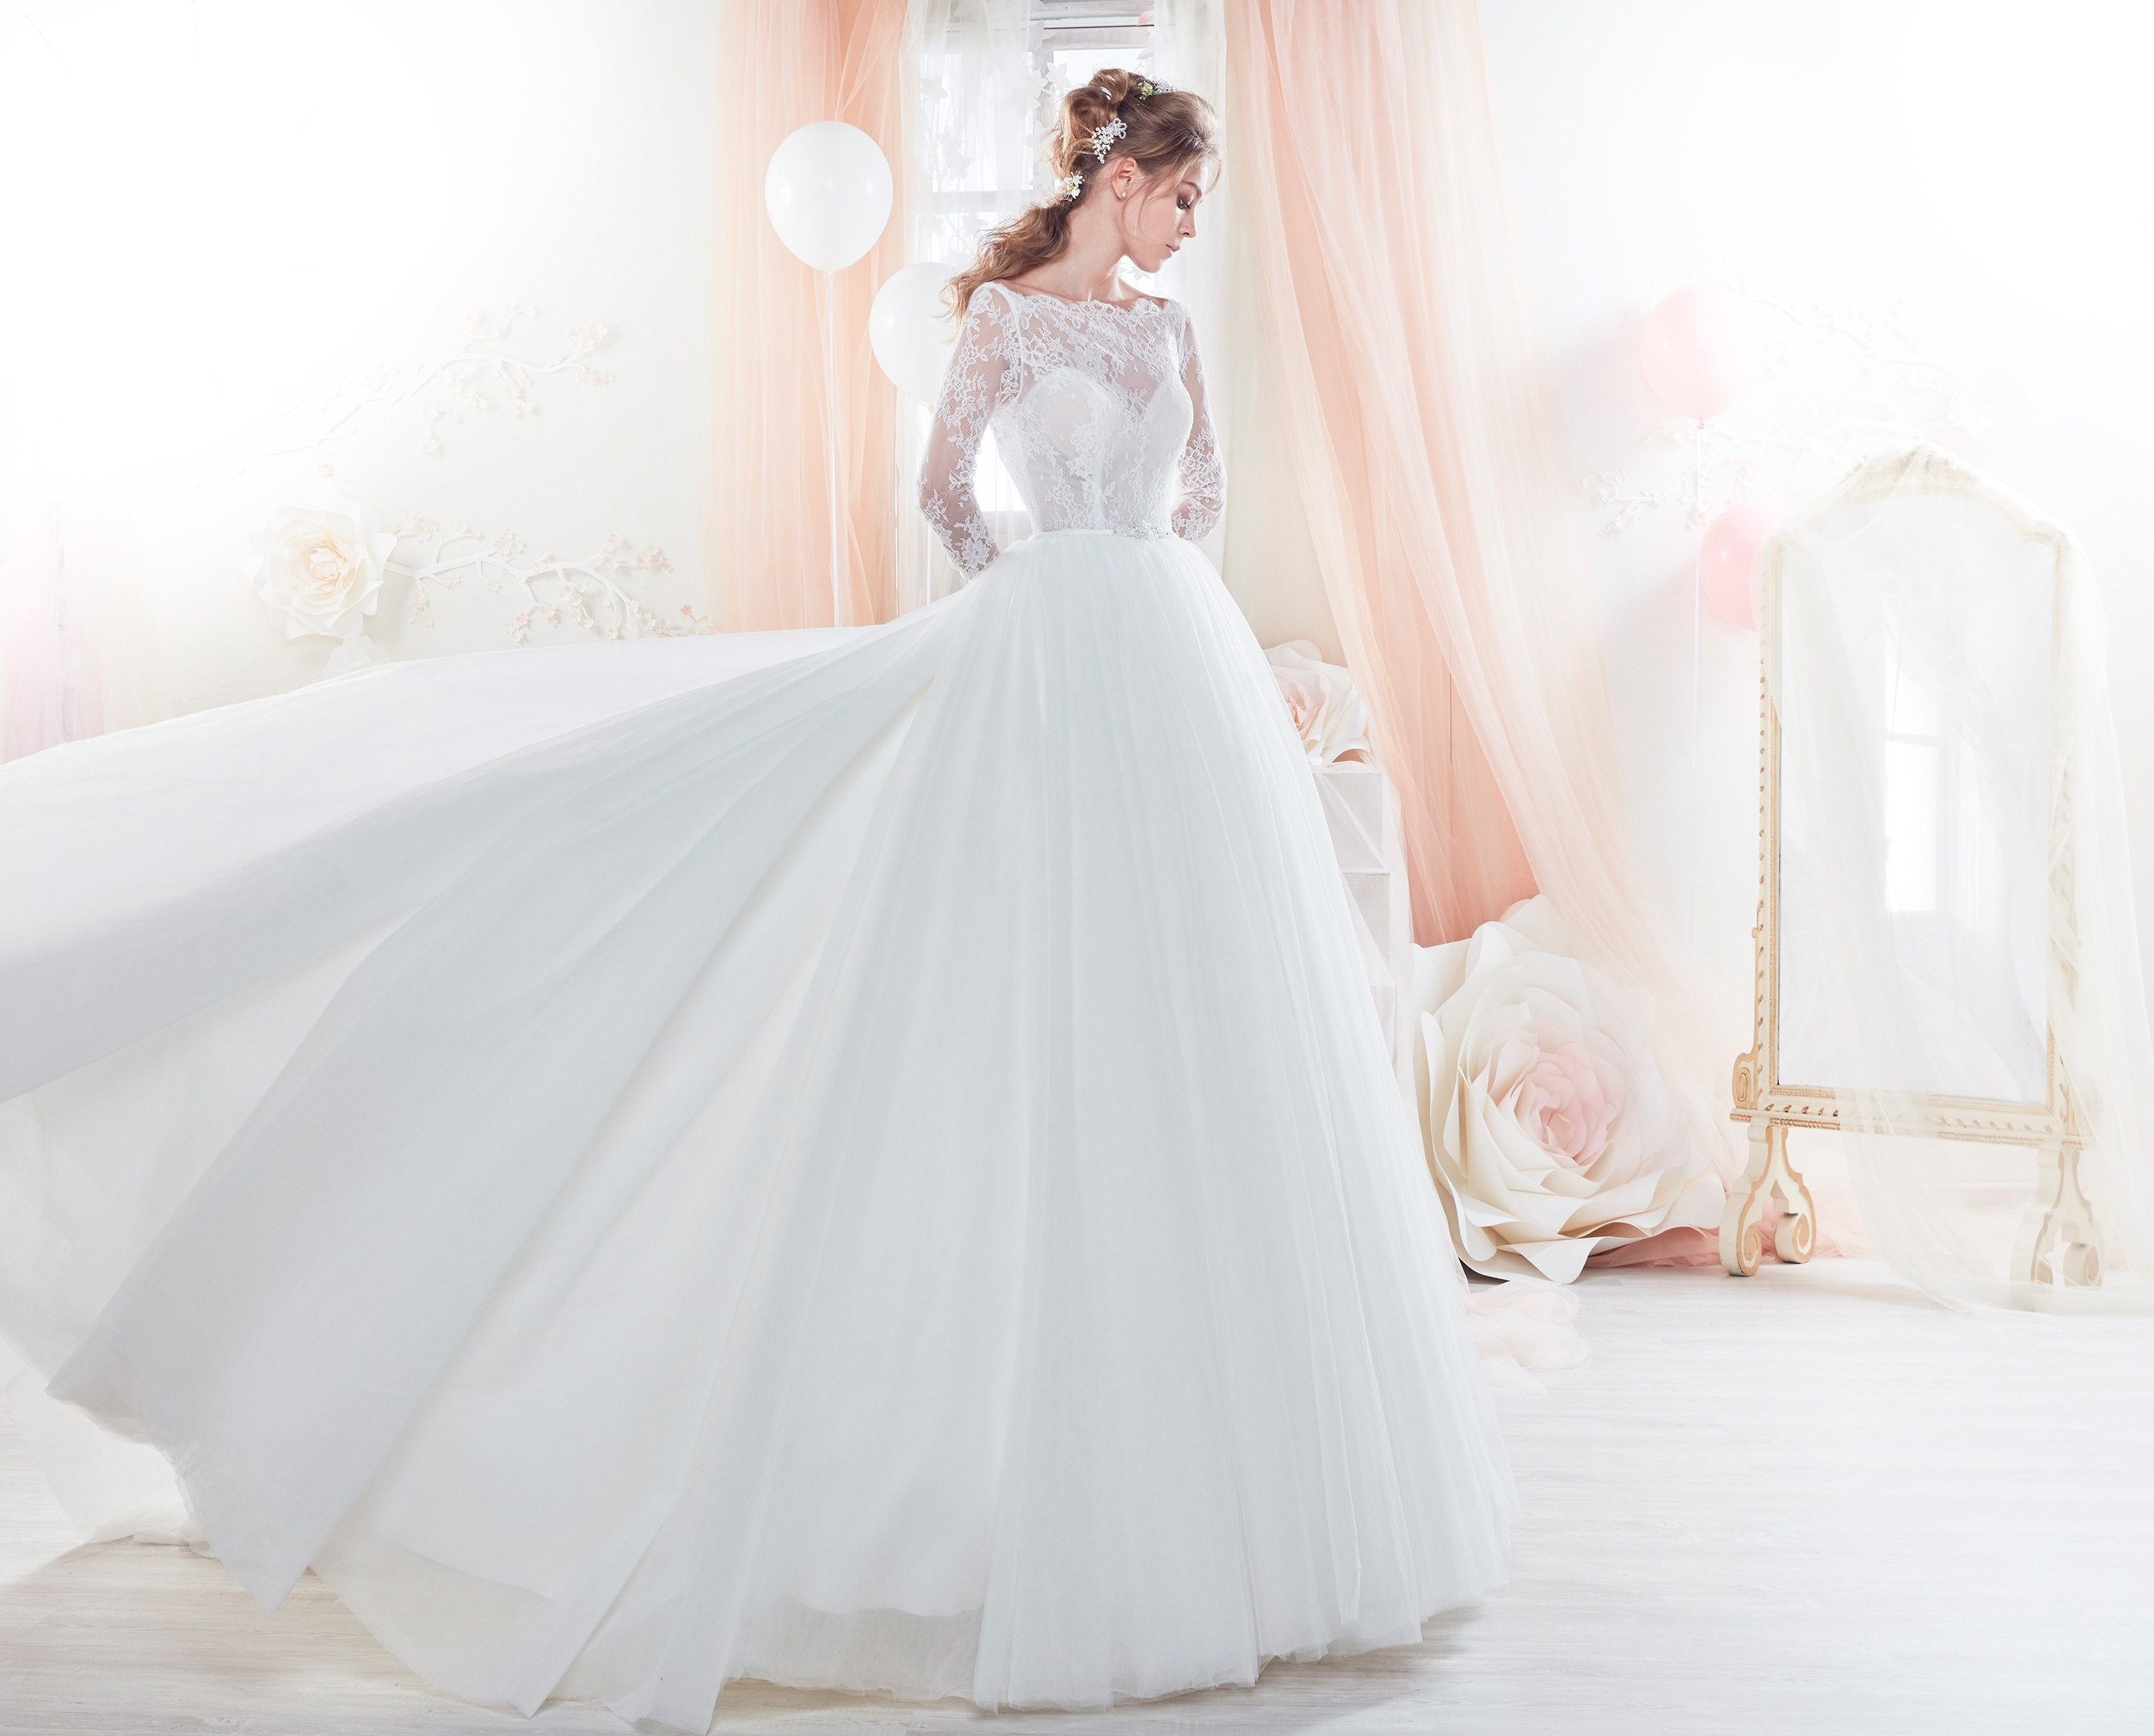 nicole spose wedding dresses price photo - 1